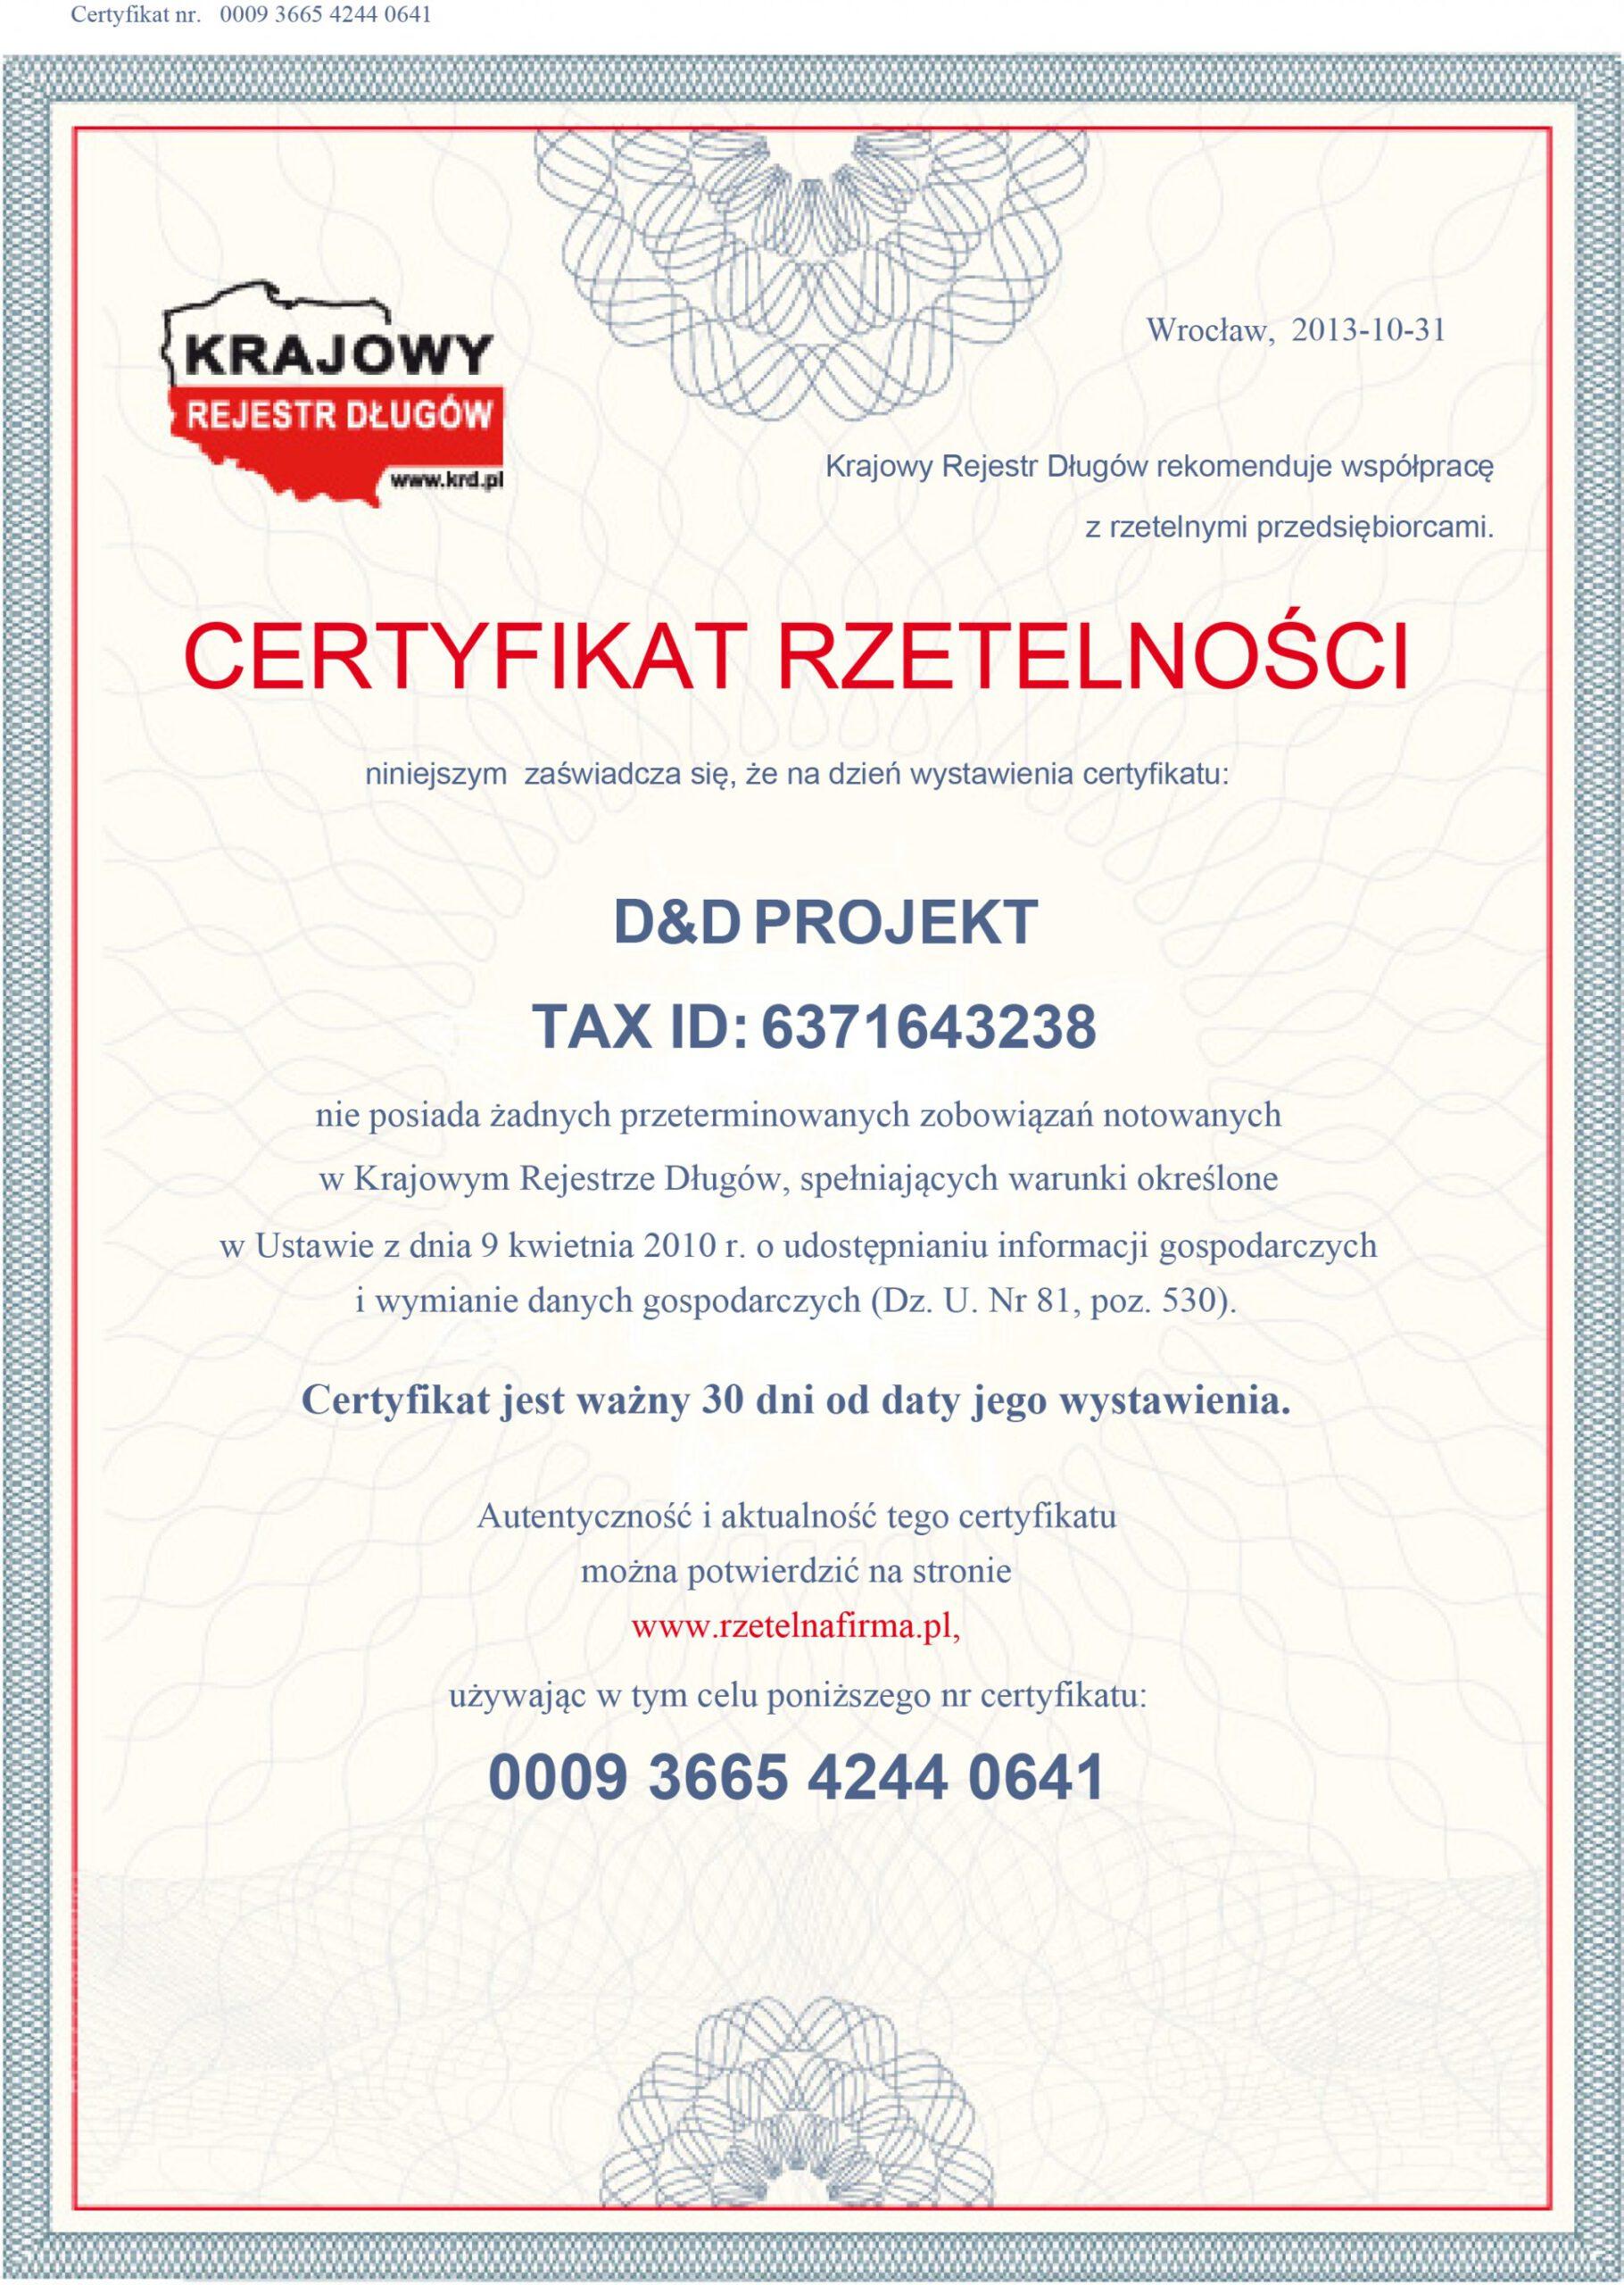 https://ddprojekt.pl/wp-content/uploads/2020/03/certyfikat-rzetelnosci-dd-projekt-pl-scaled.jpg